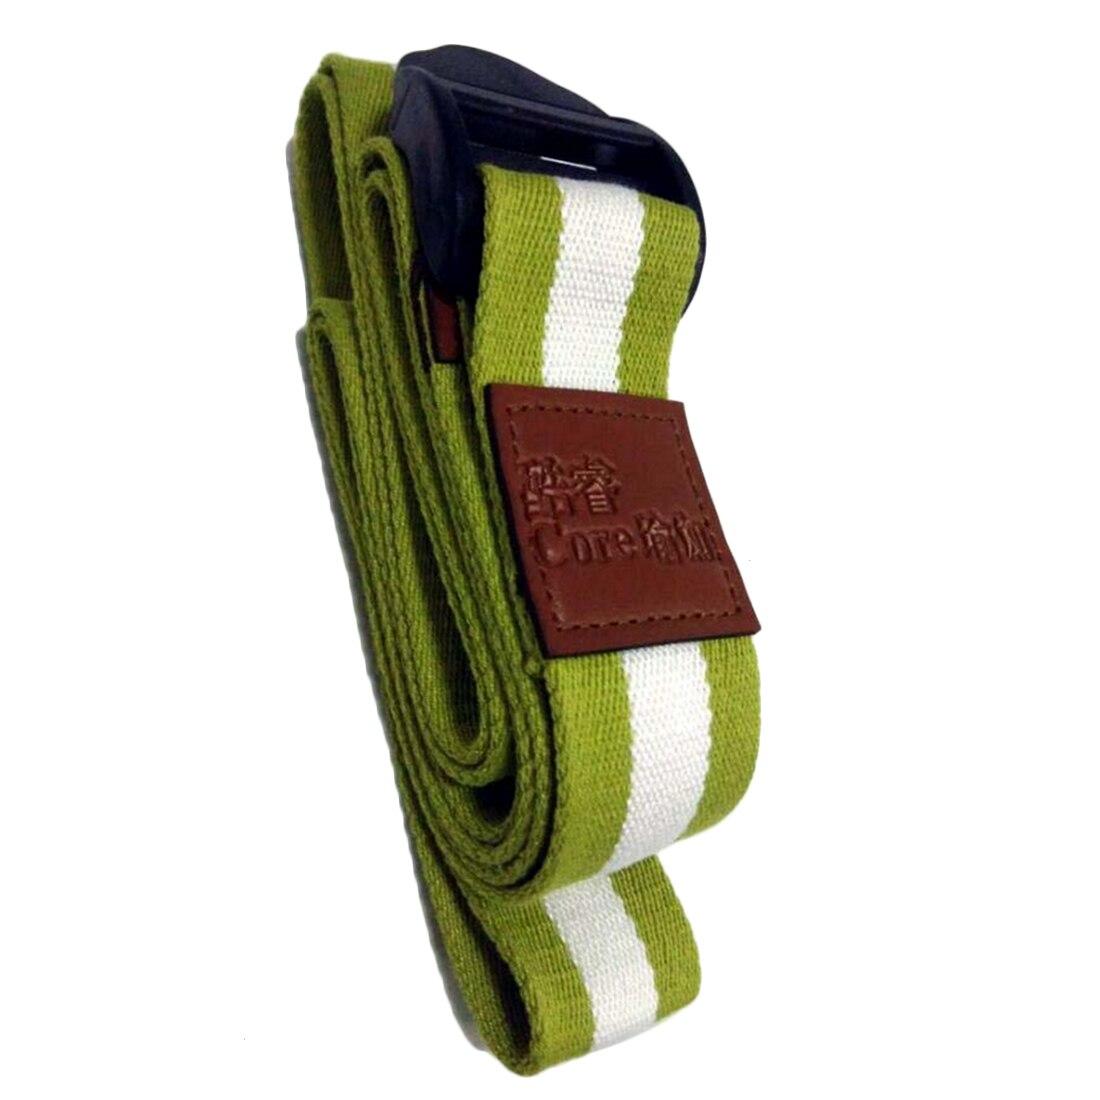 1.8M Cotton Yoga Stretching Stretch Strap Pilates Belt Waist Leg Fitness Exercise Gym - Green